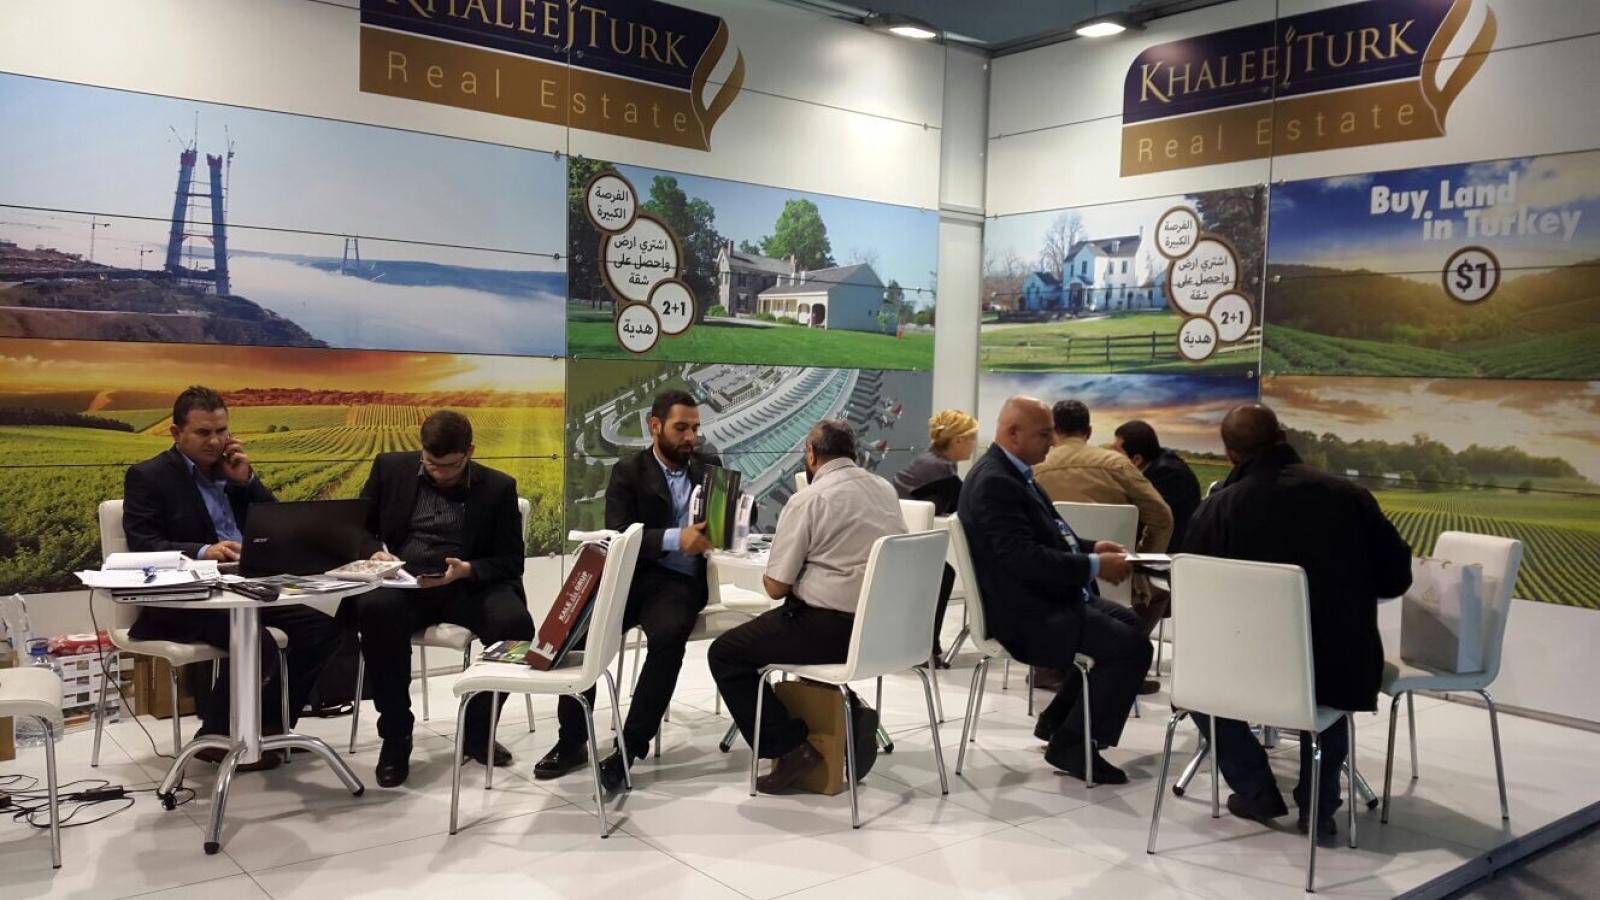 www.khaleejturk.com Khaleejturk International Real Estate